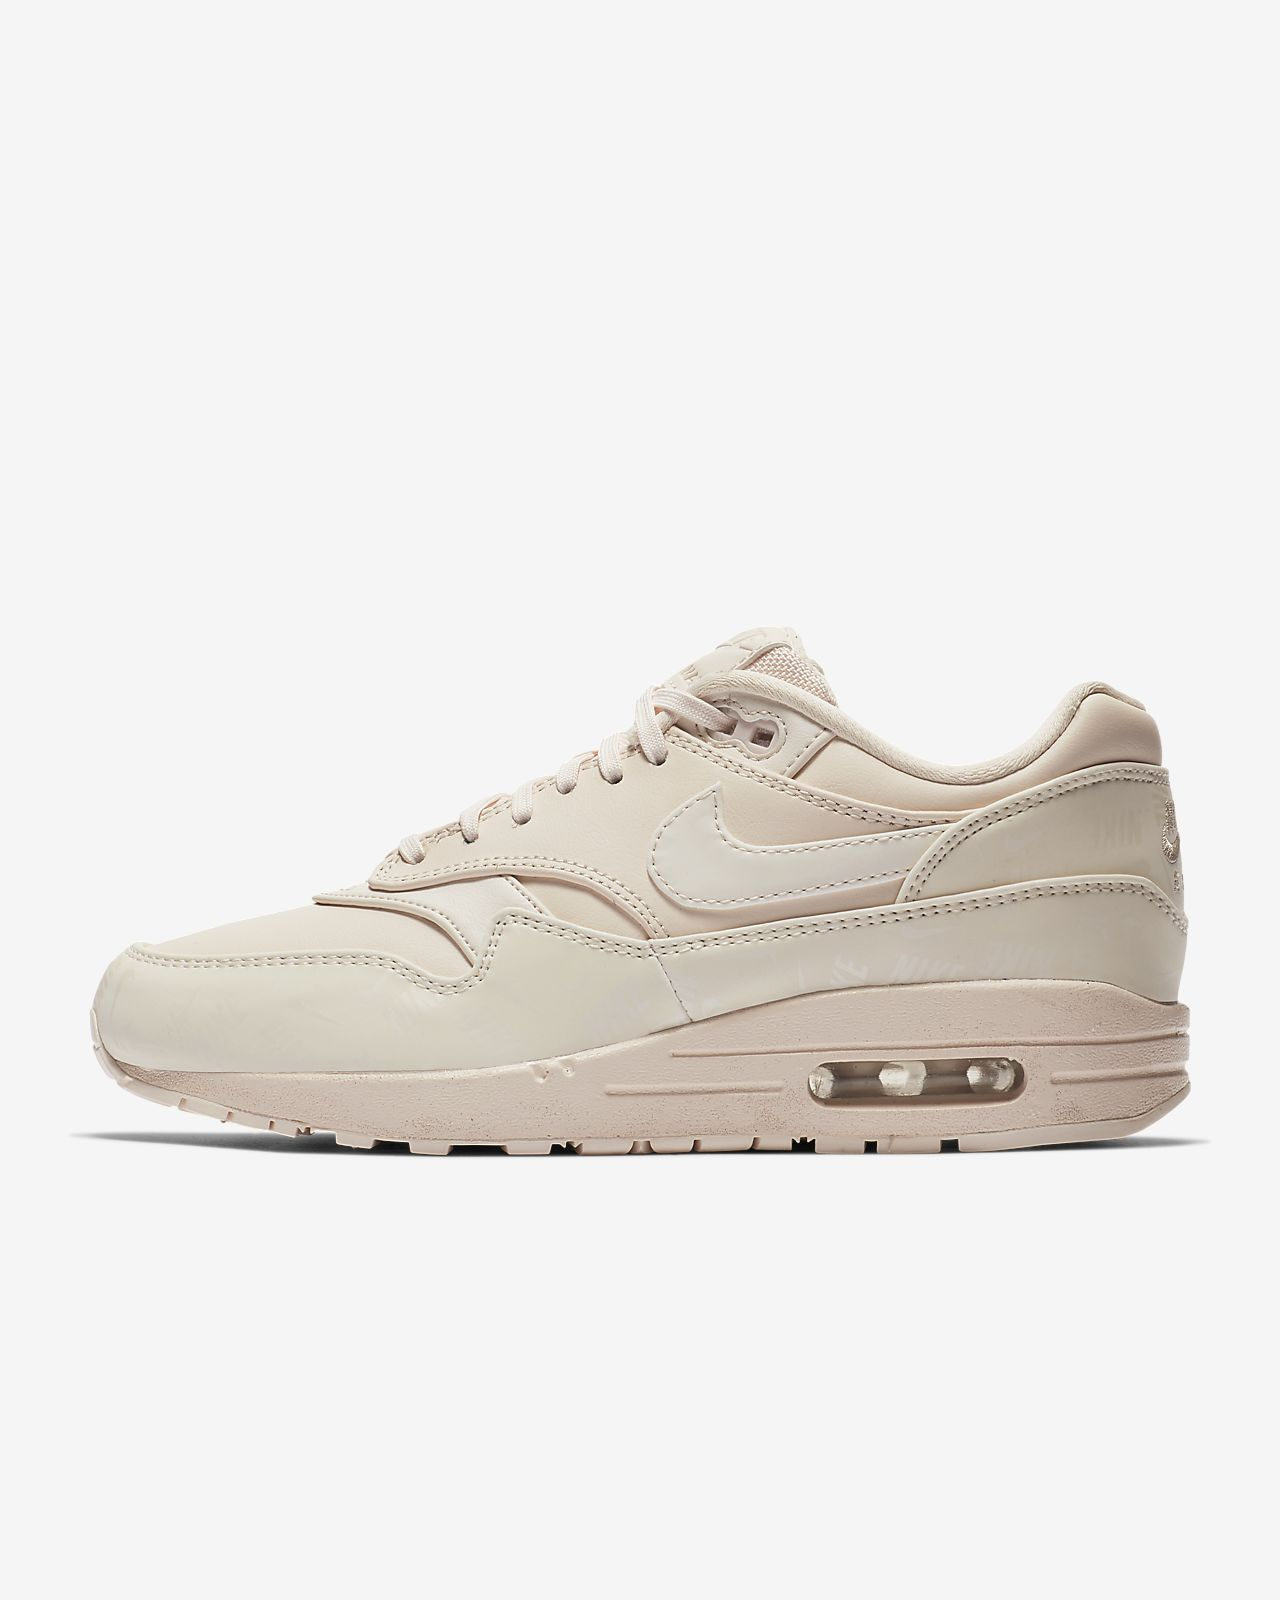 best sneakers 6666d 50451 ... Nike Air Max 1 LX Women s Shoe